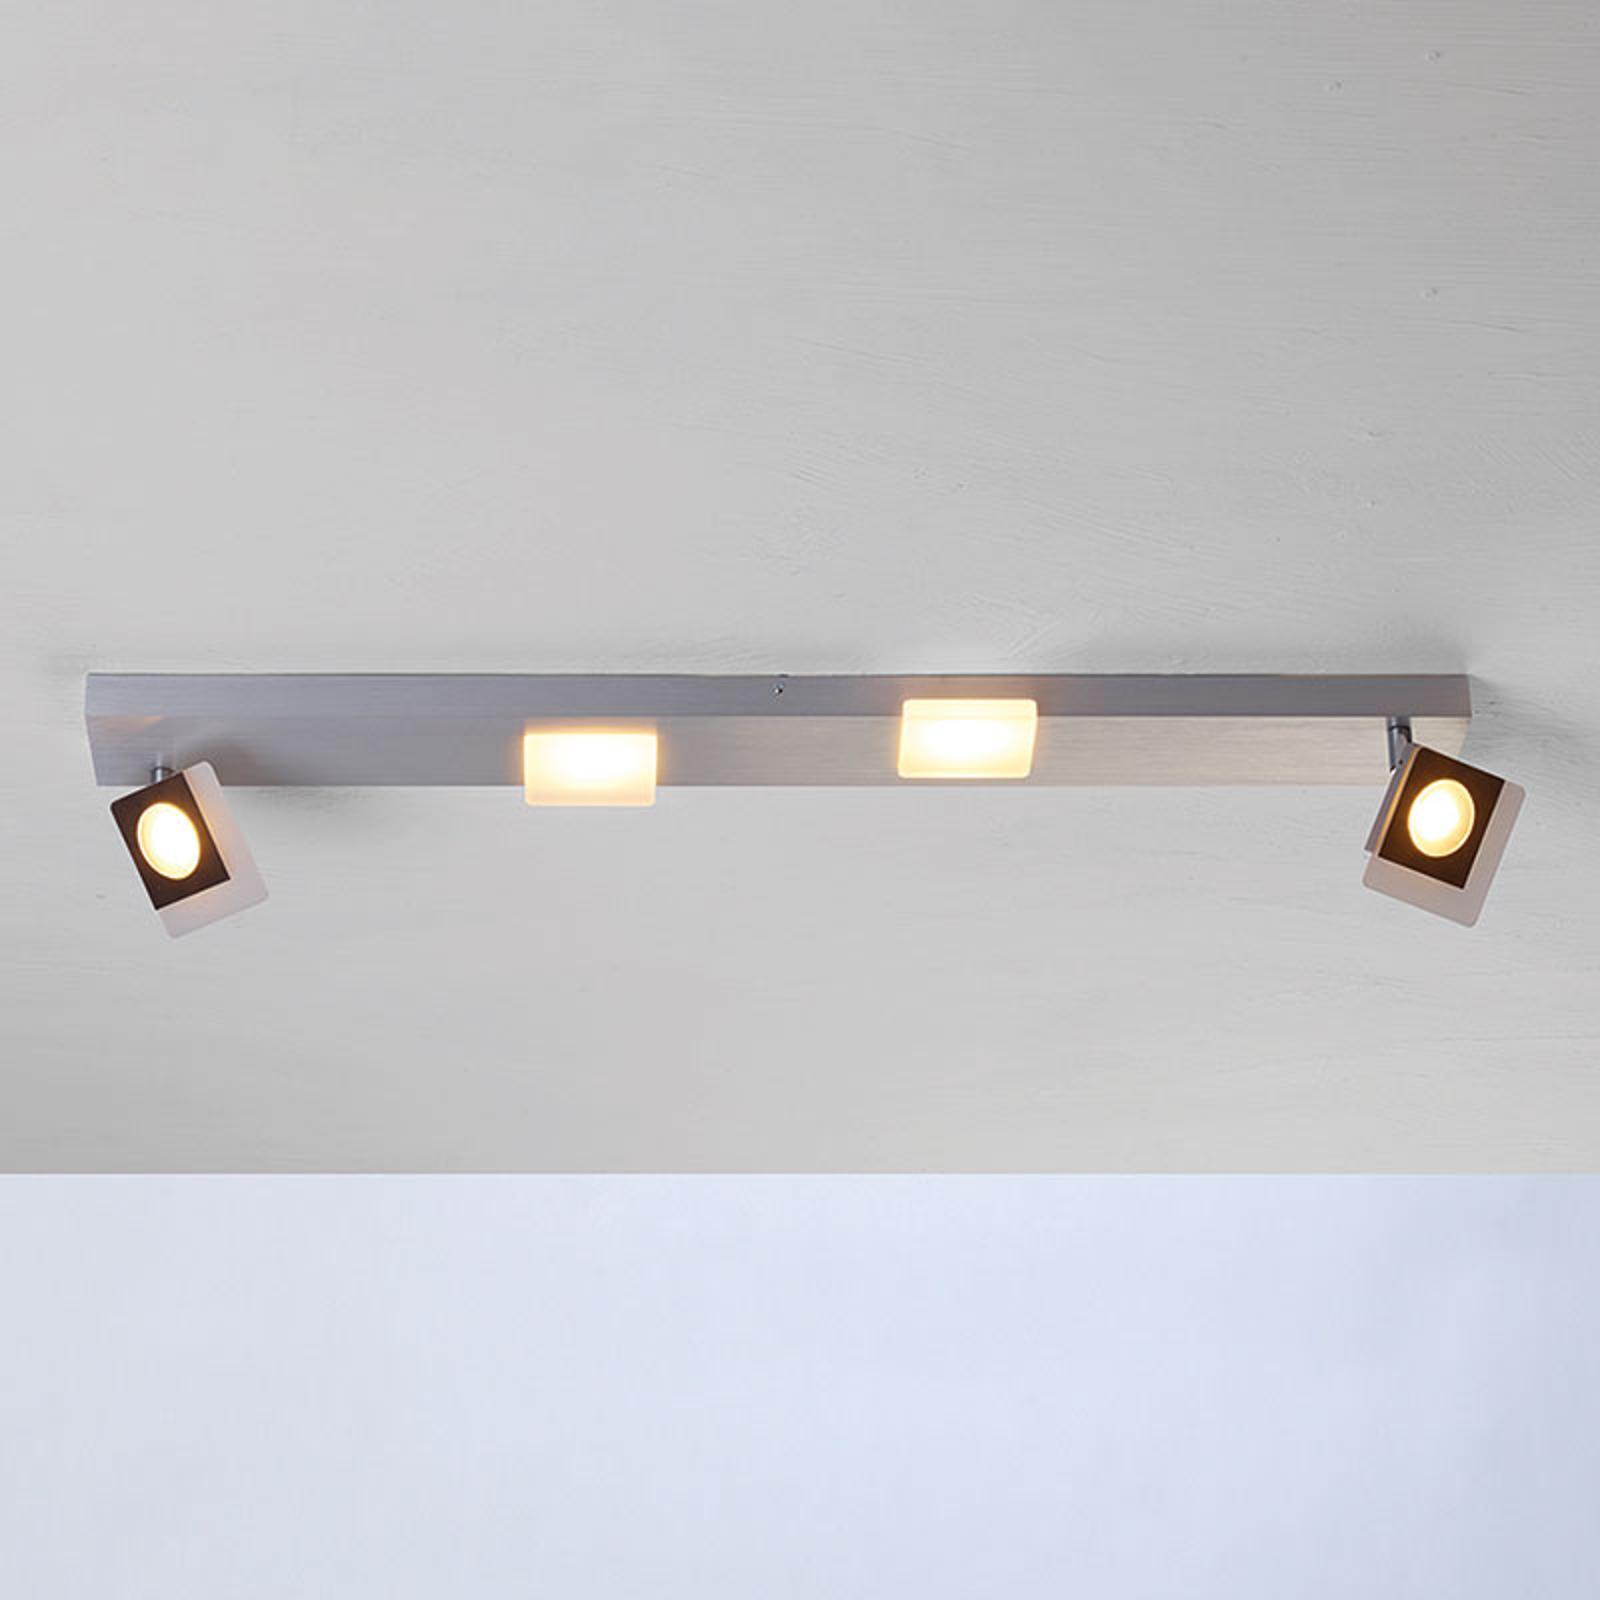 Bopp Session - LED plafondlamp met twee spots